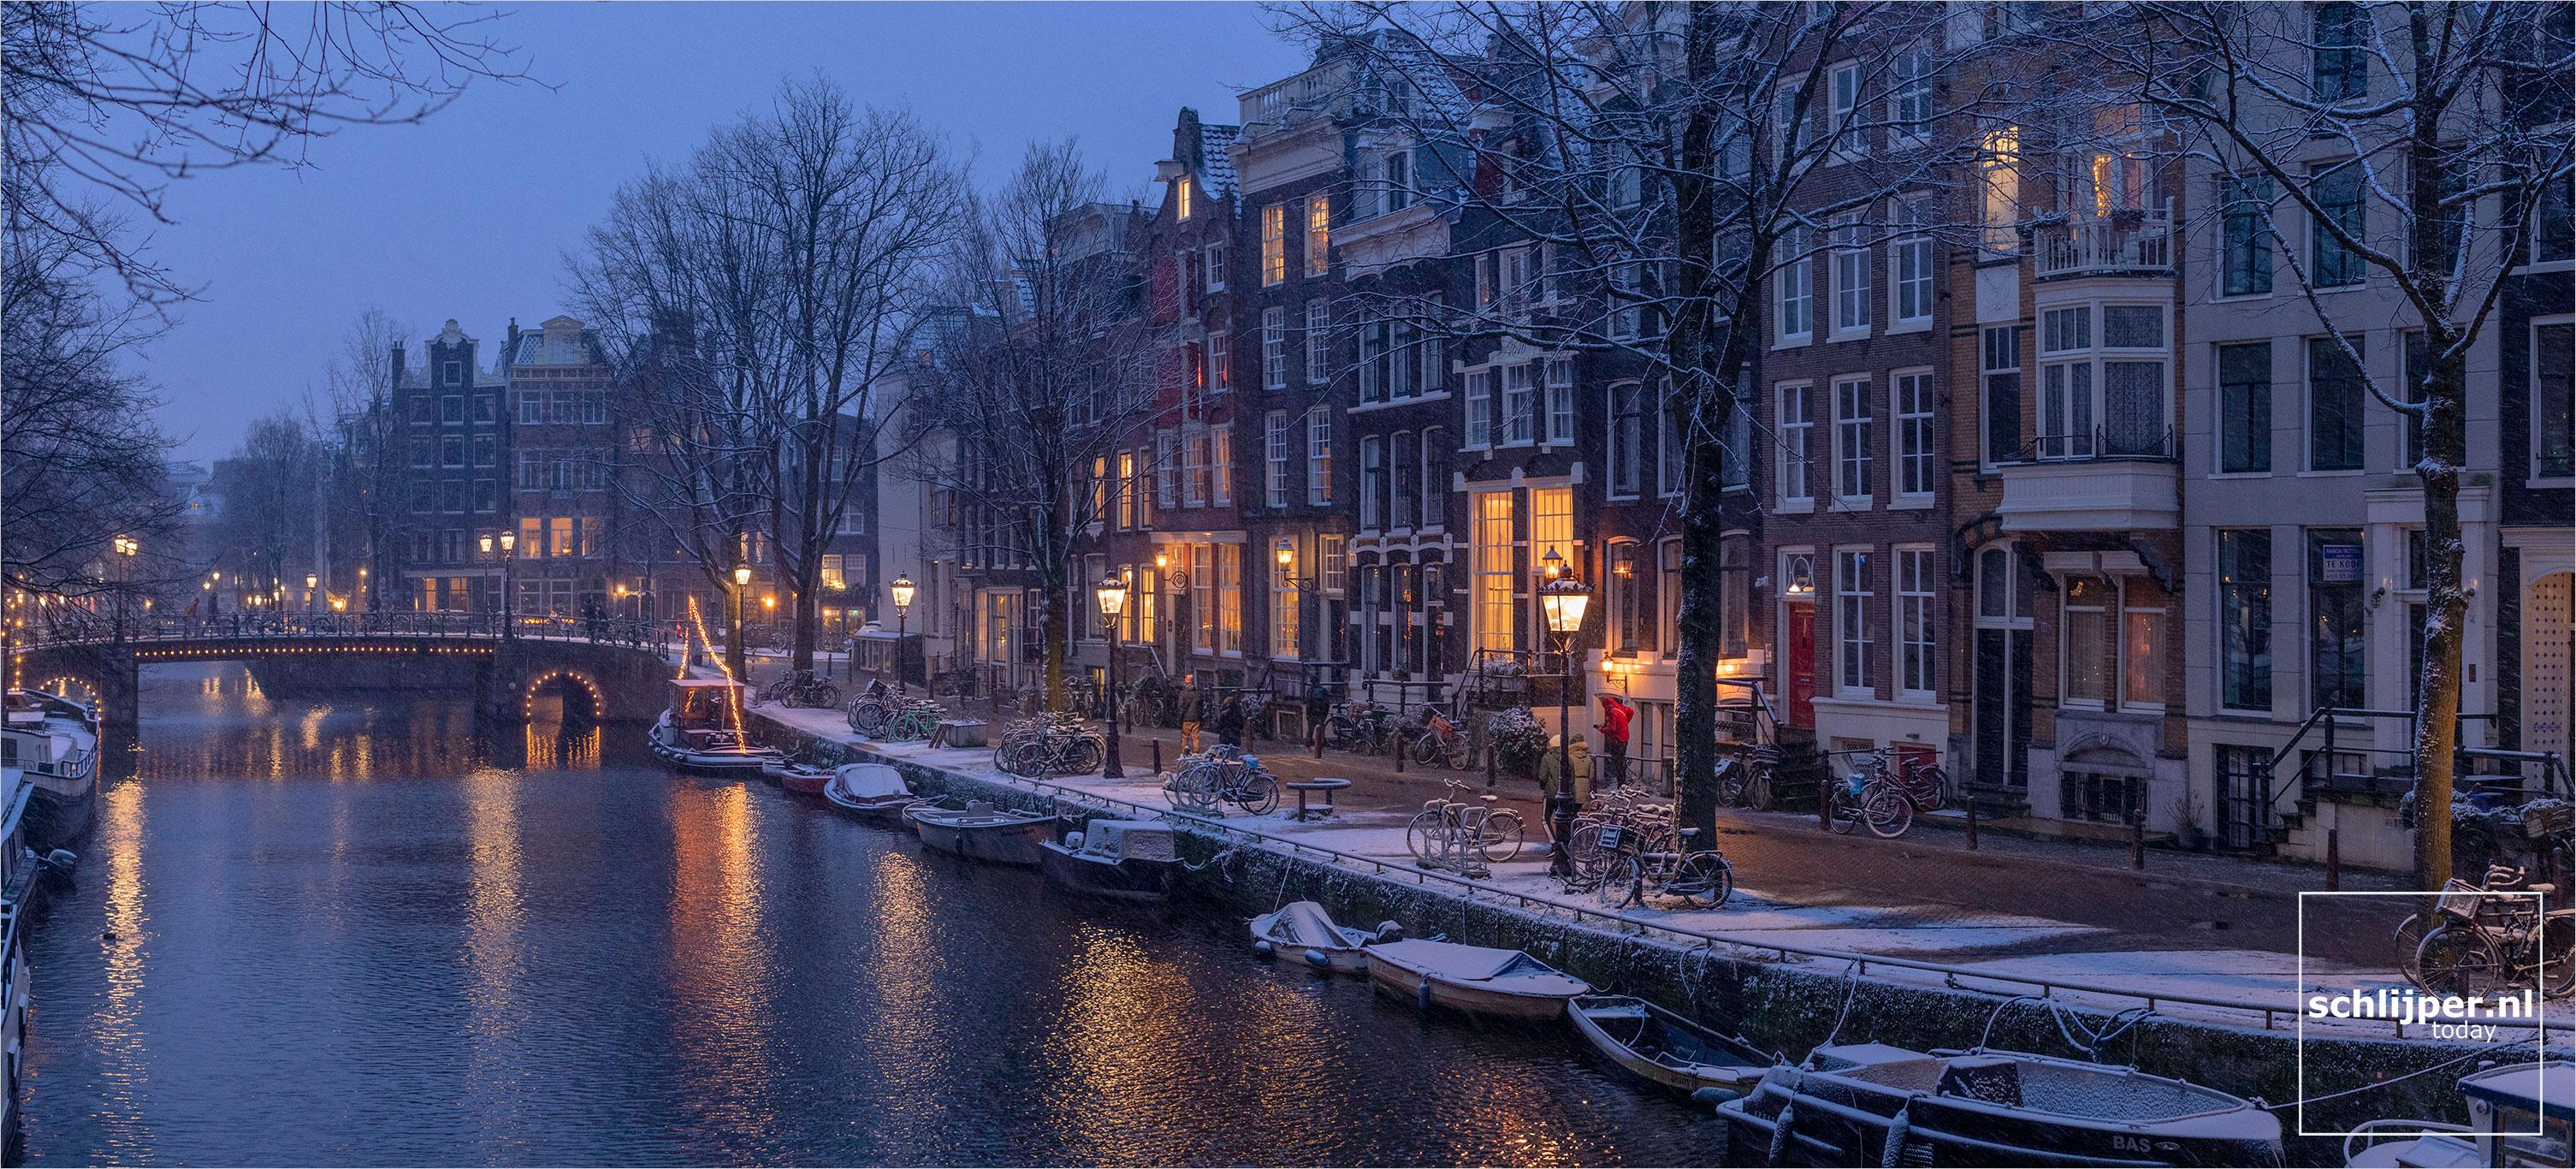 The Netherlands, Amsterdam, 16 januari 2021